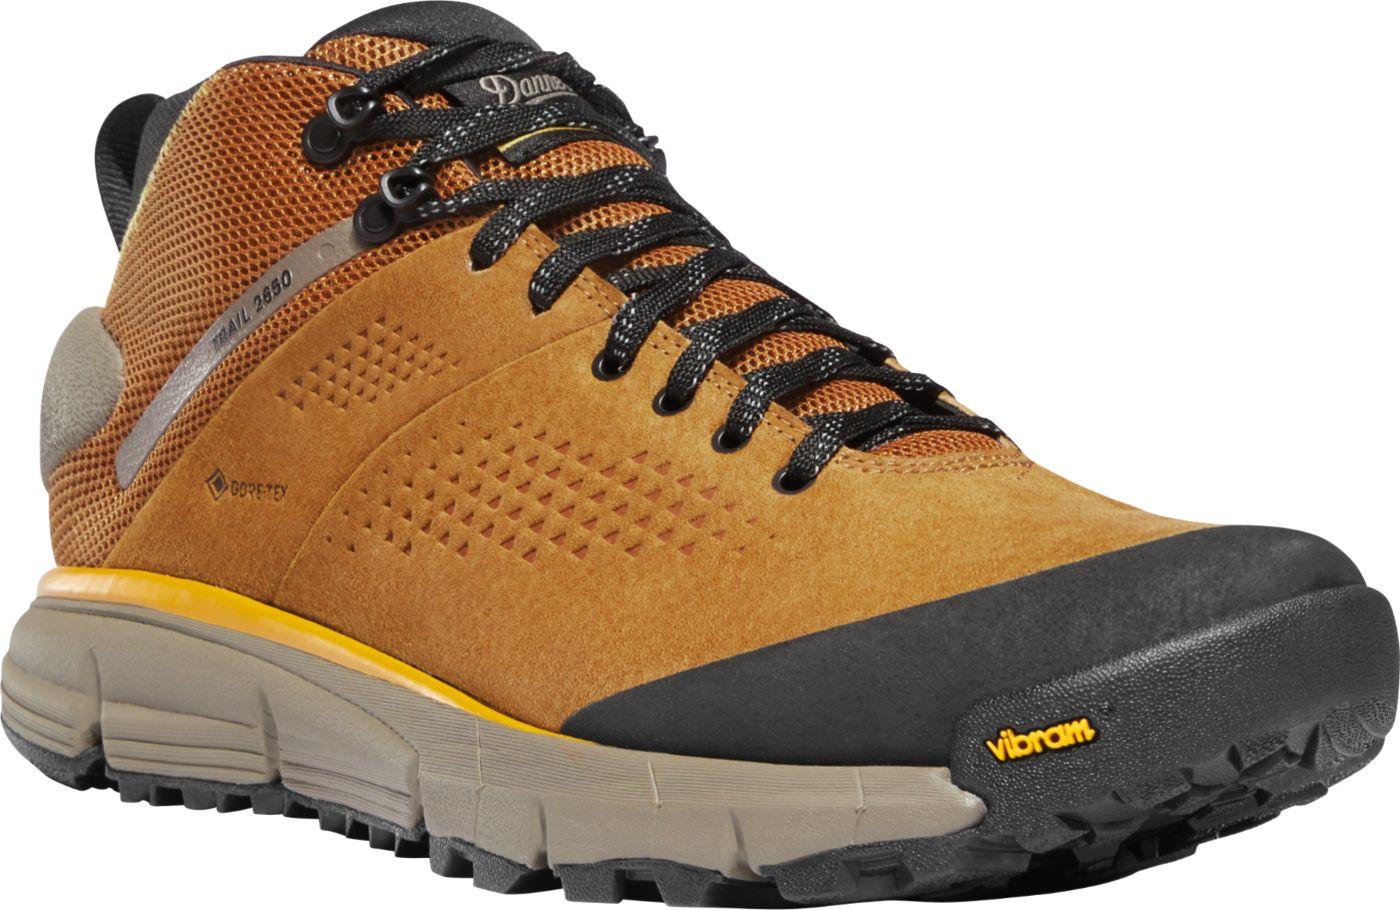 39c7fd928d4 Danner Men's Trail 2650 GTX Mid 4